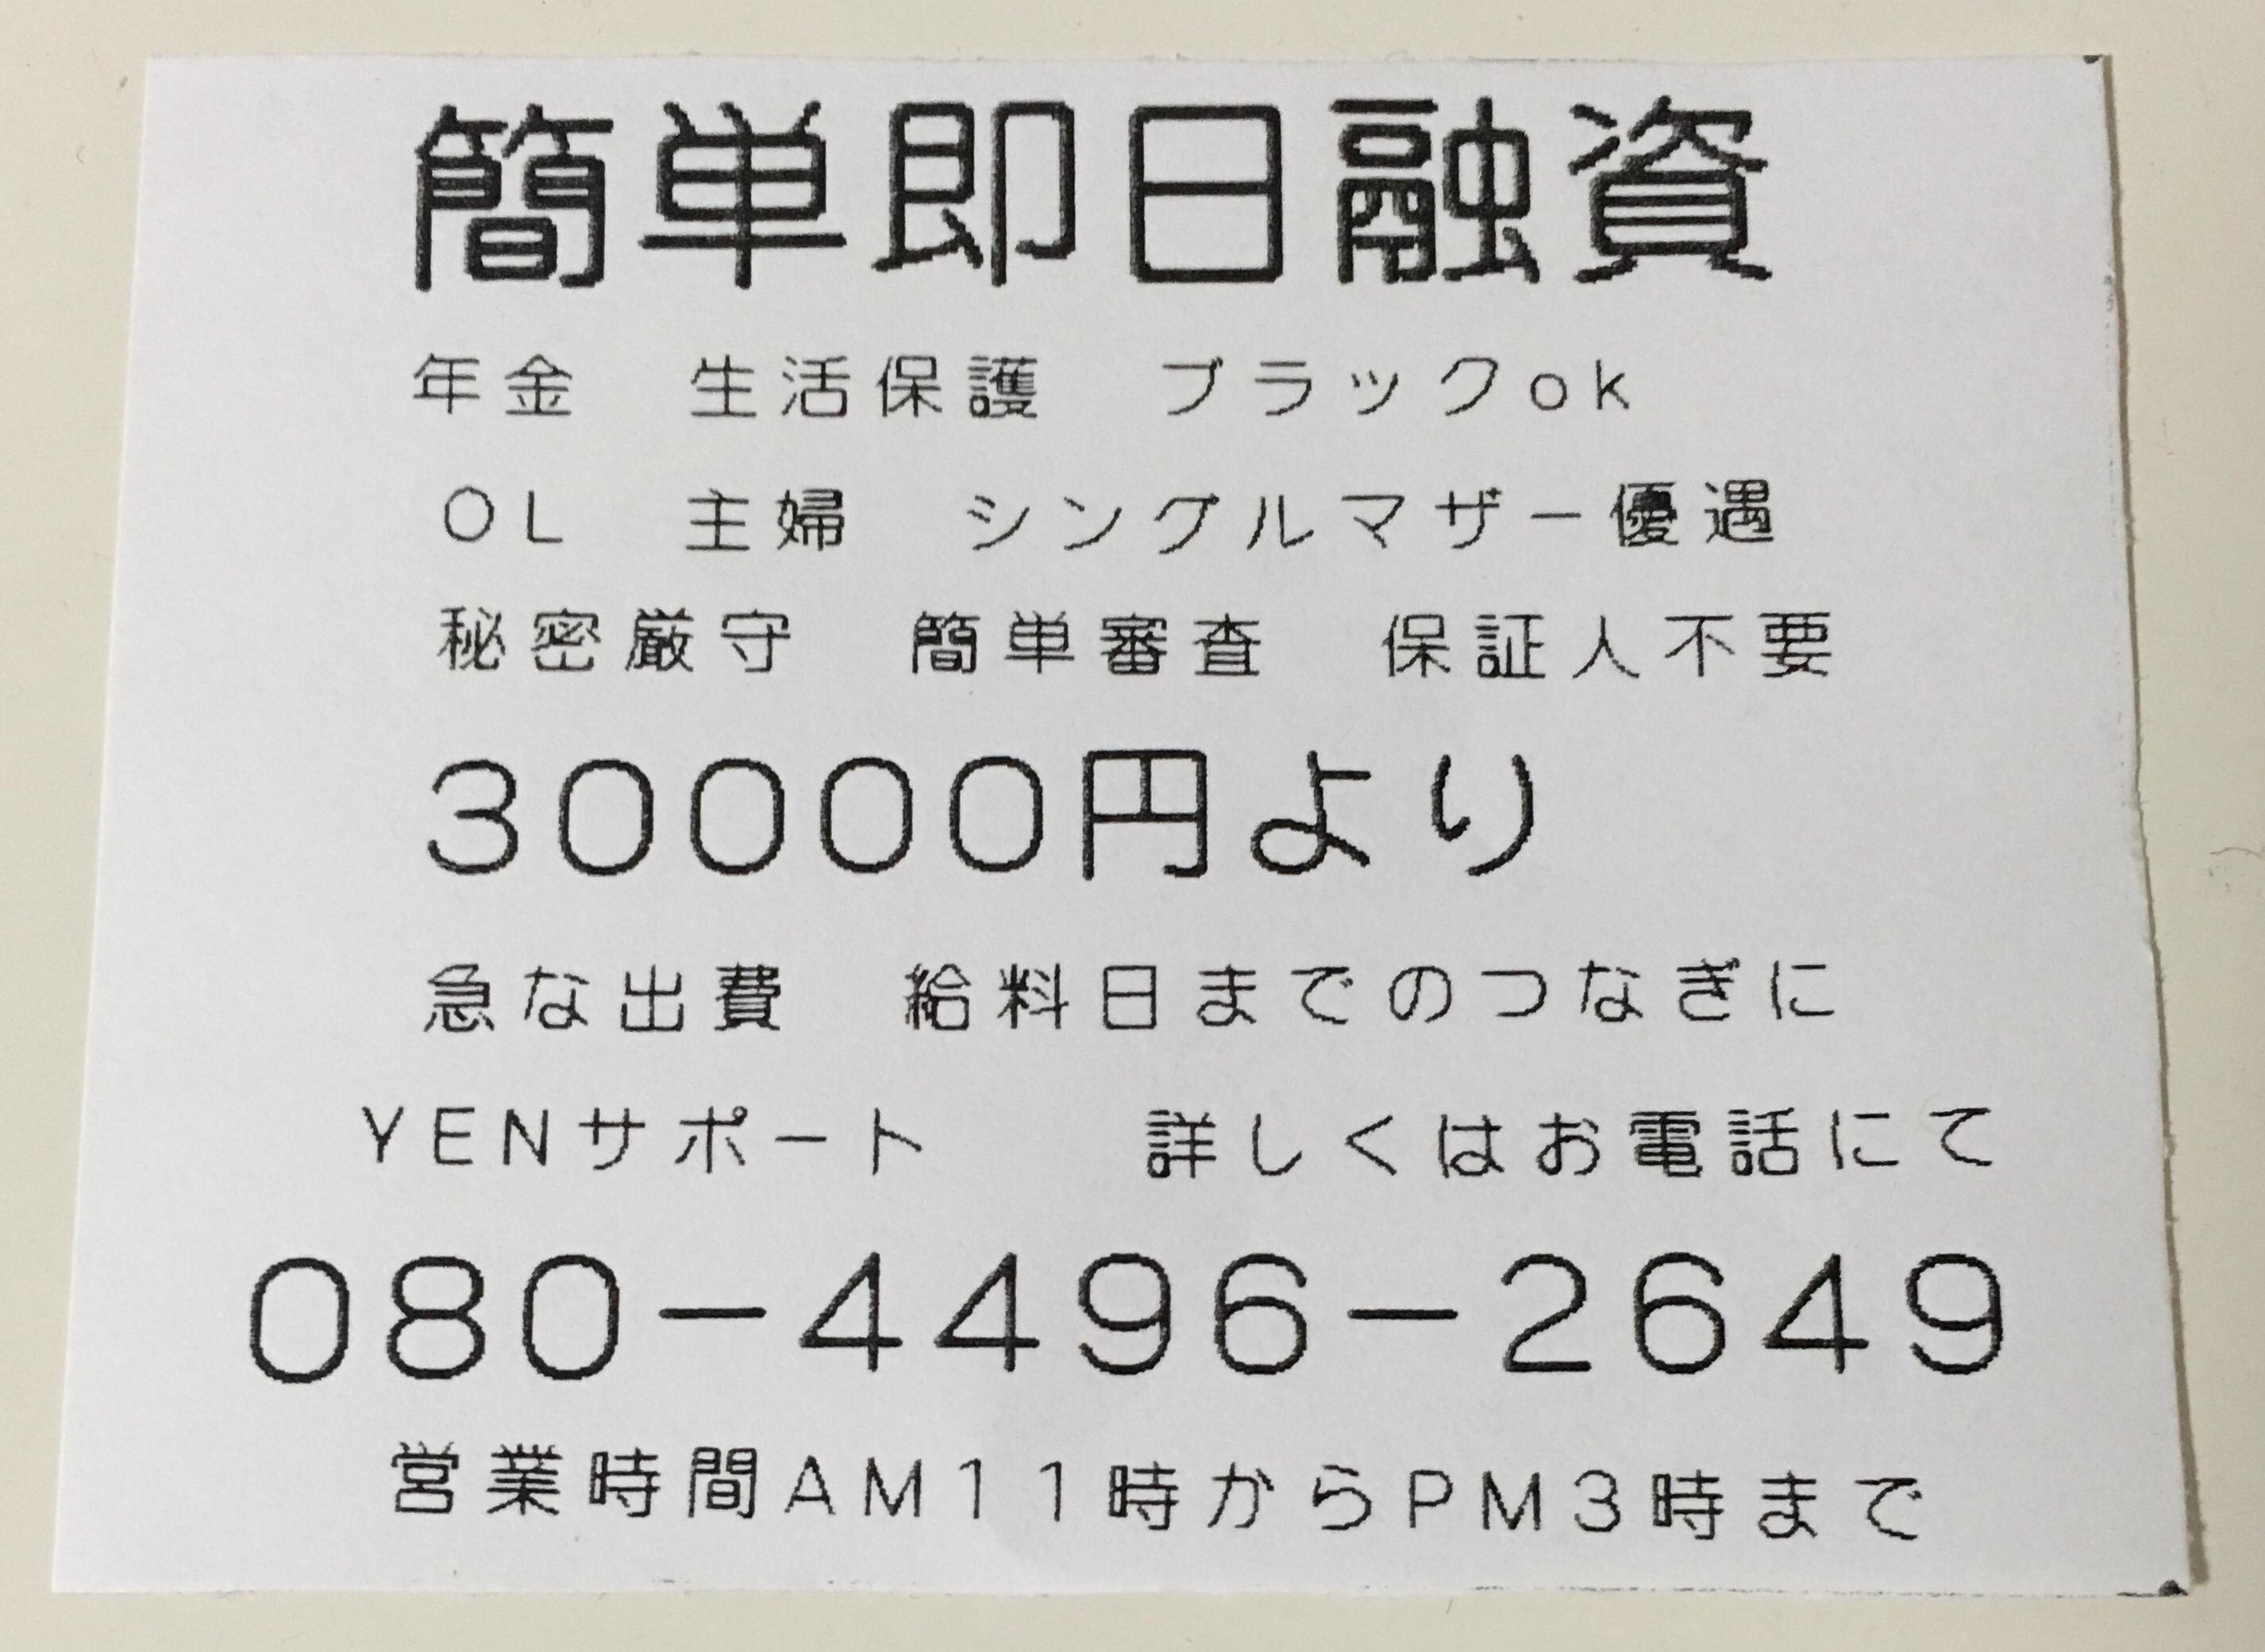 yensaport